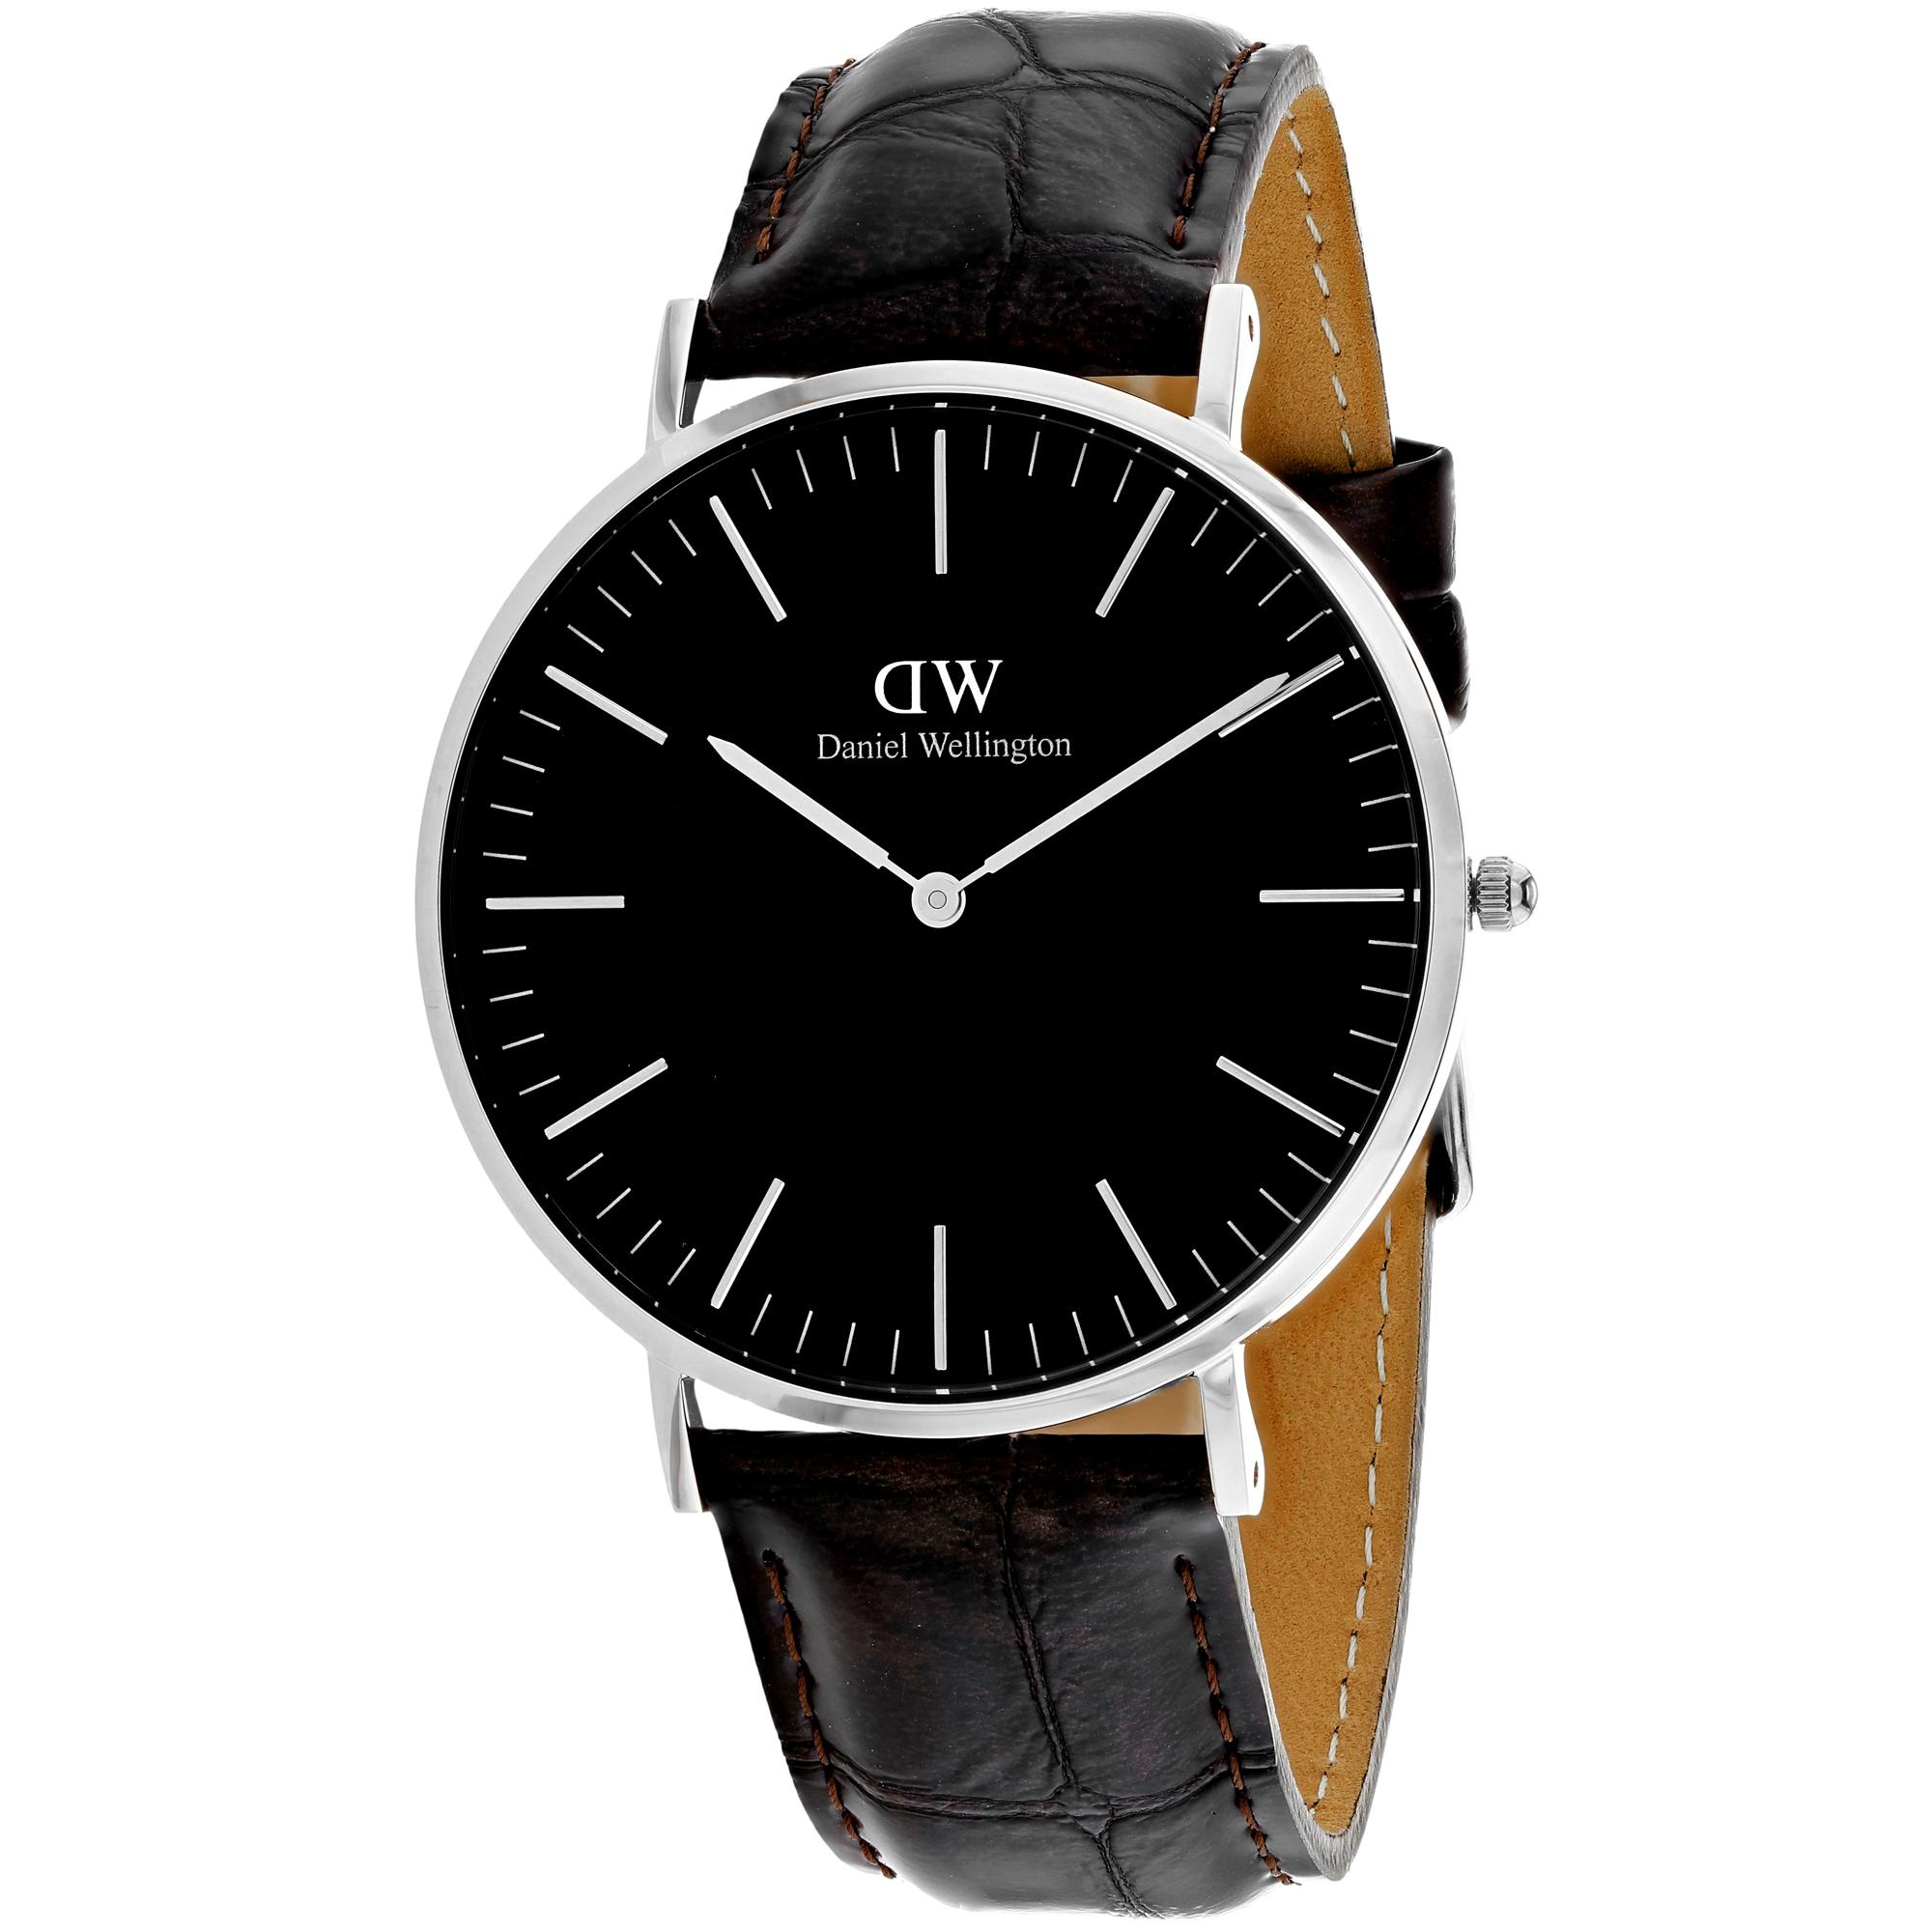 Daniel Wellington Men's DW00100134 Classic York Watches (...